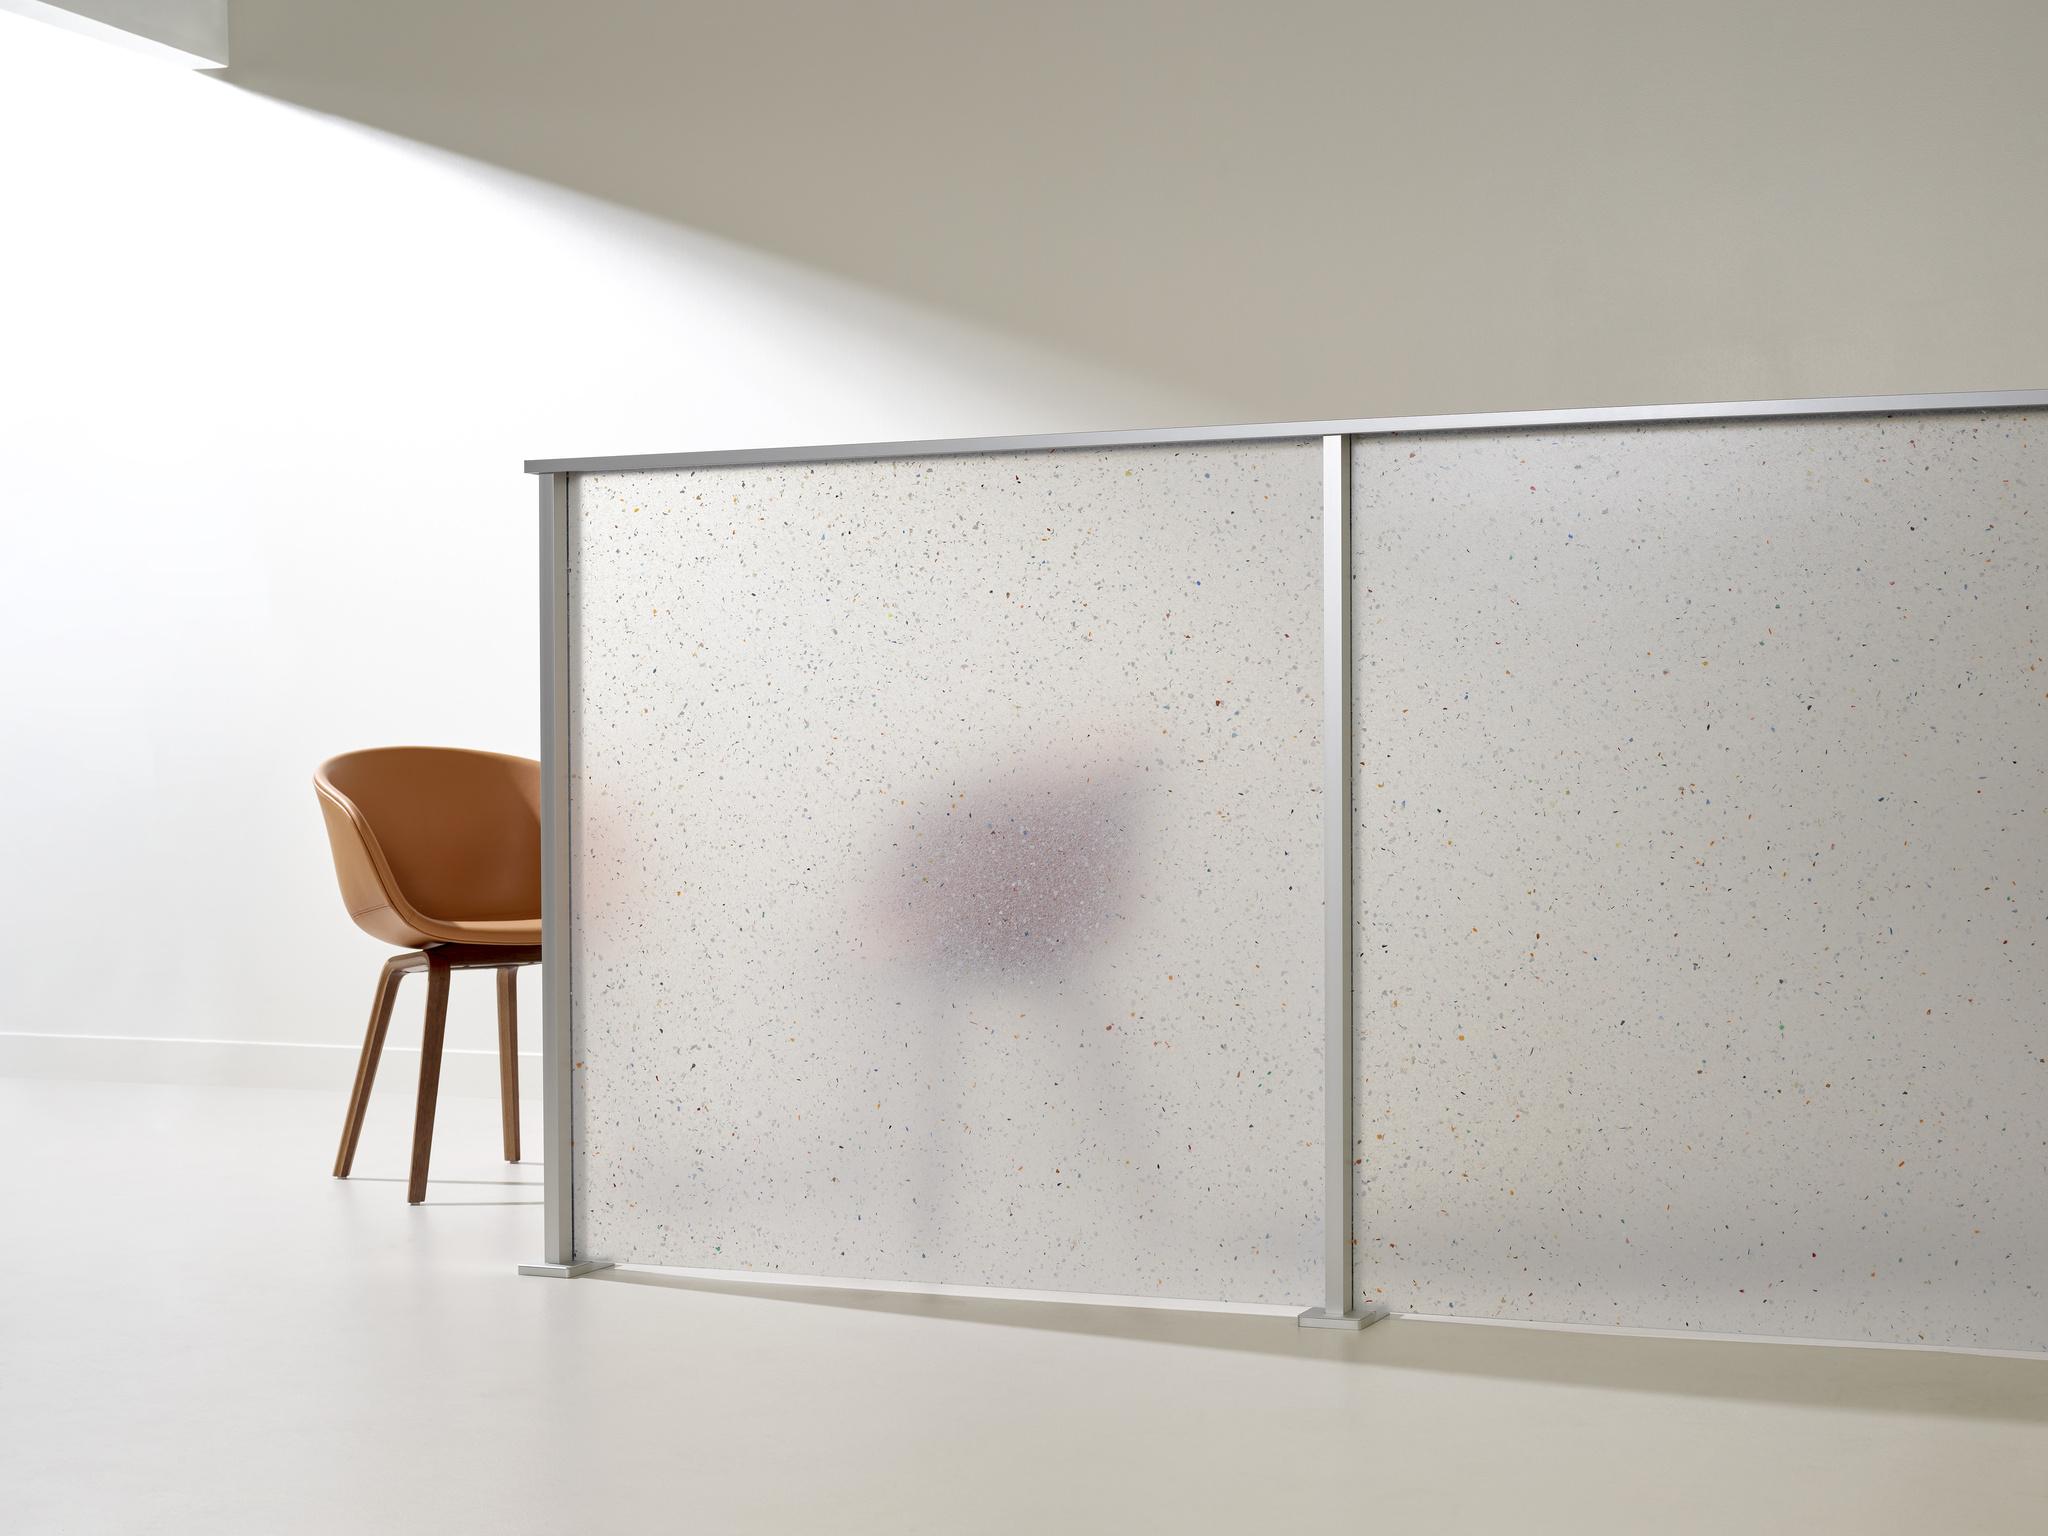 3form-varia-flek-pure-iltuo-clear-anodized-detail-02-landscape-1